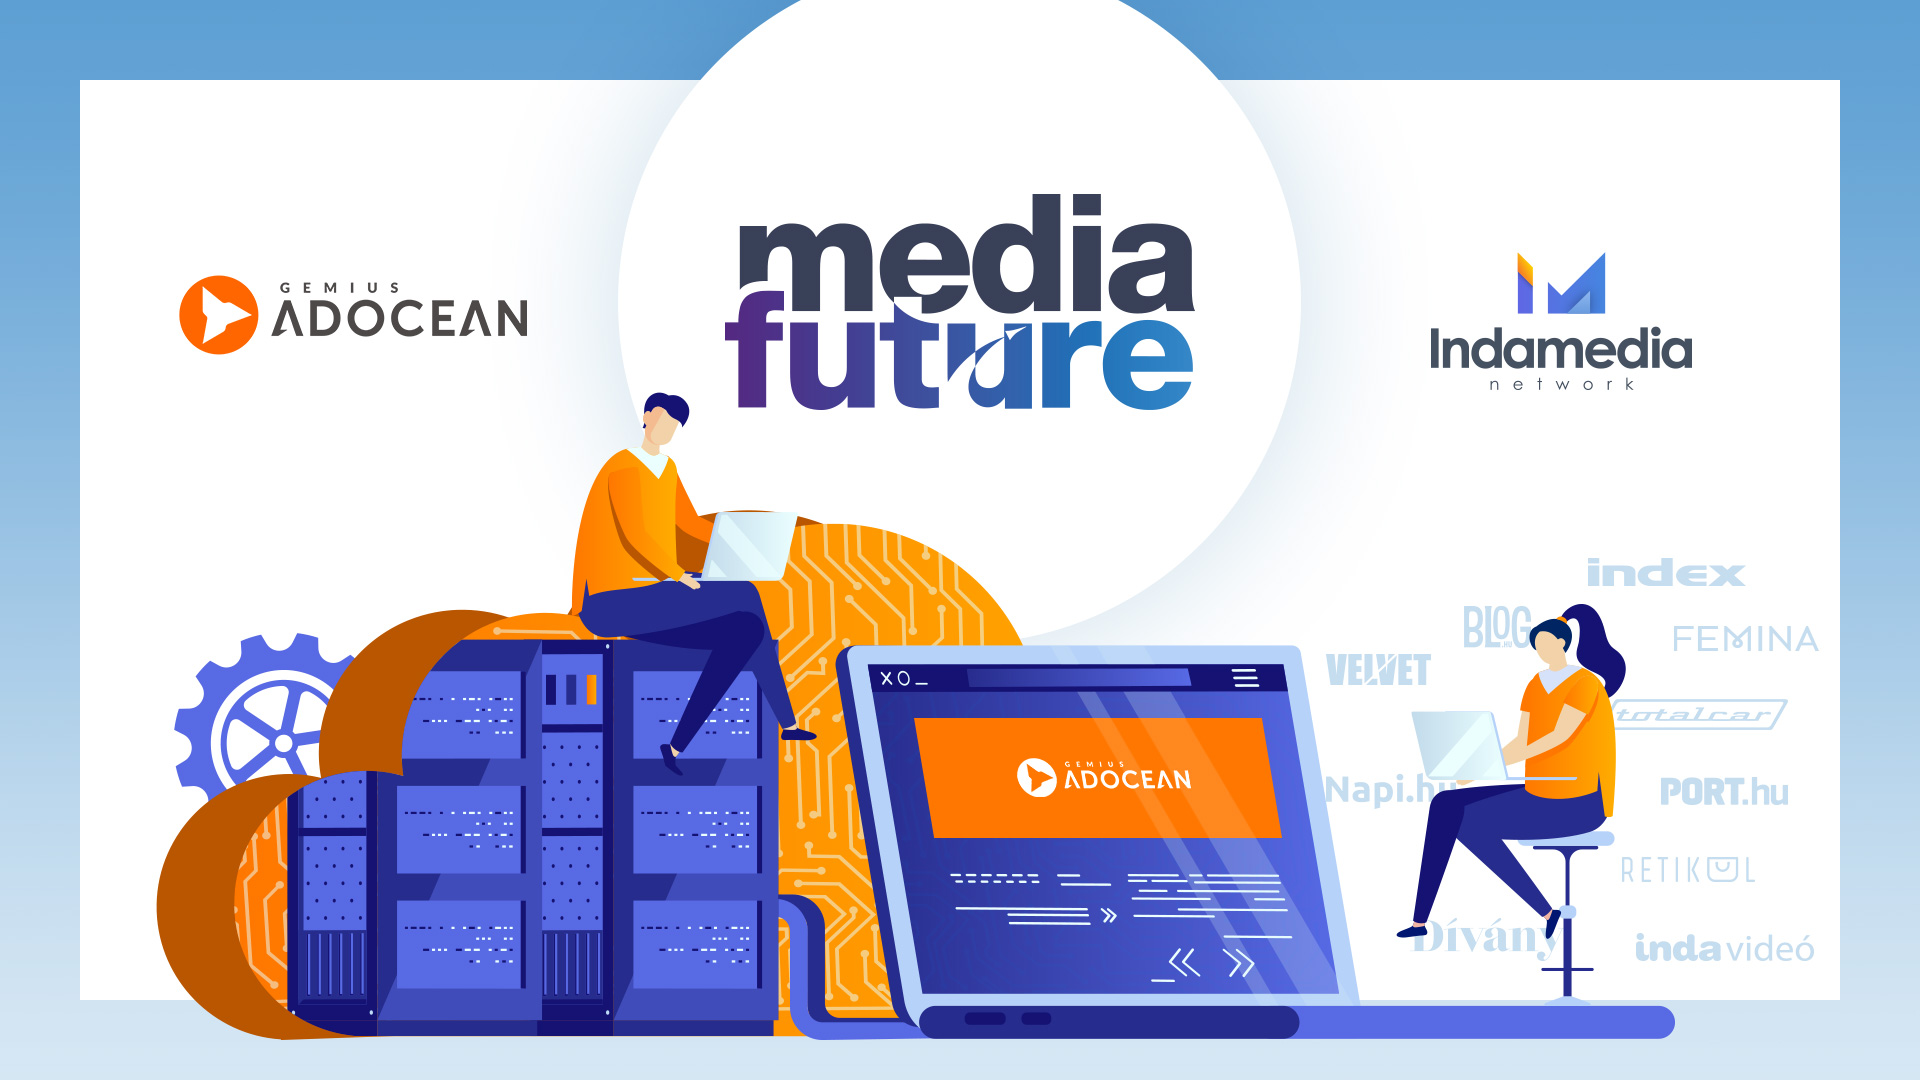 media_future_adocean_indamedia_network.jpg